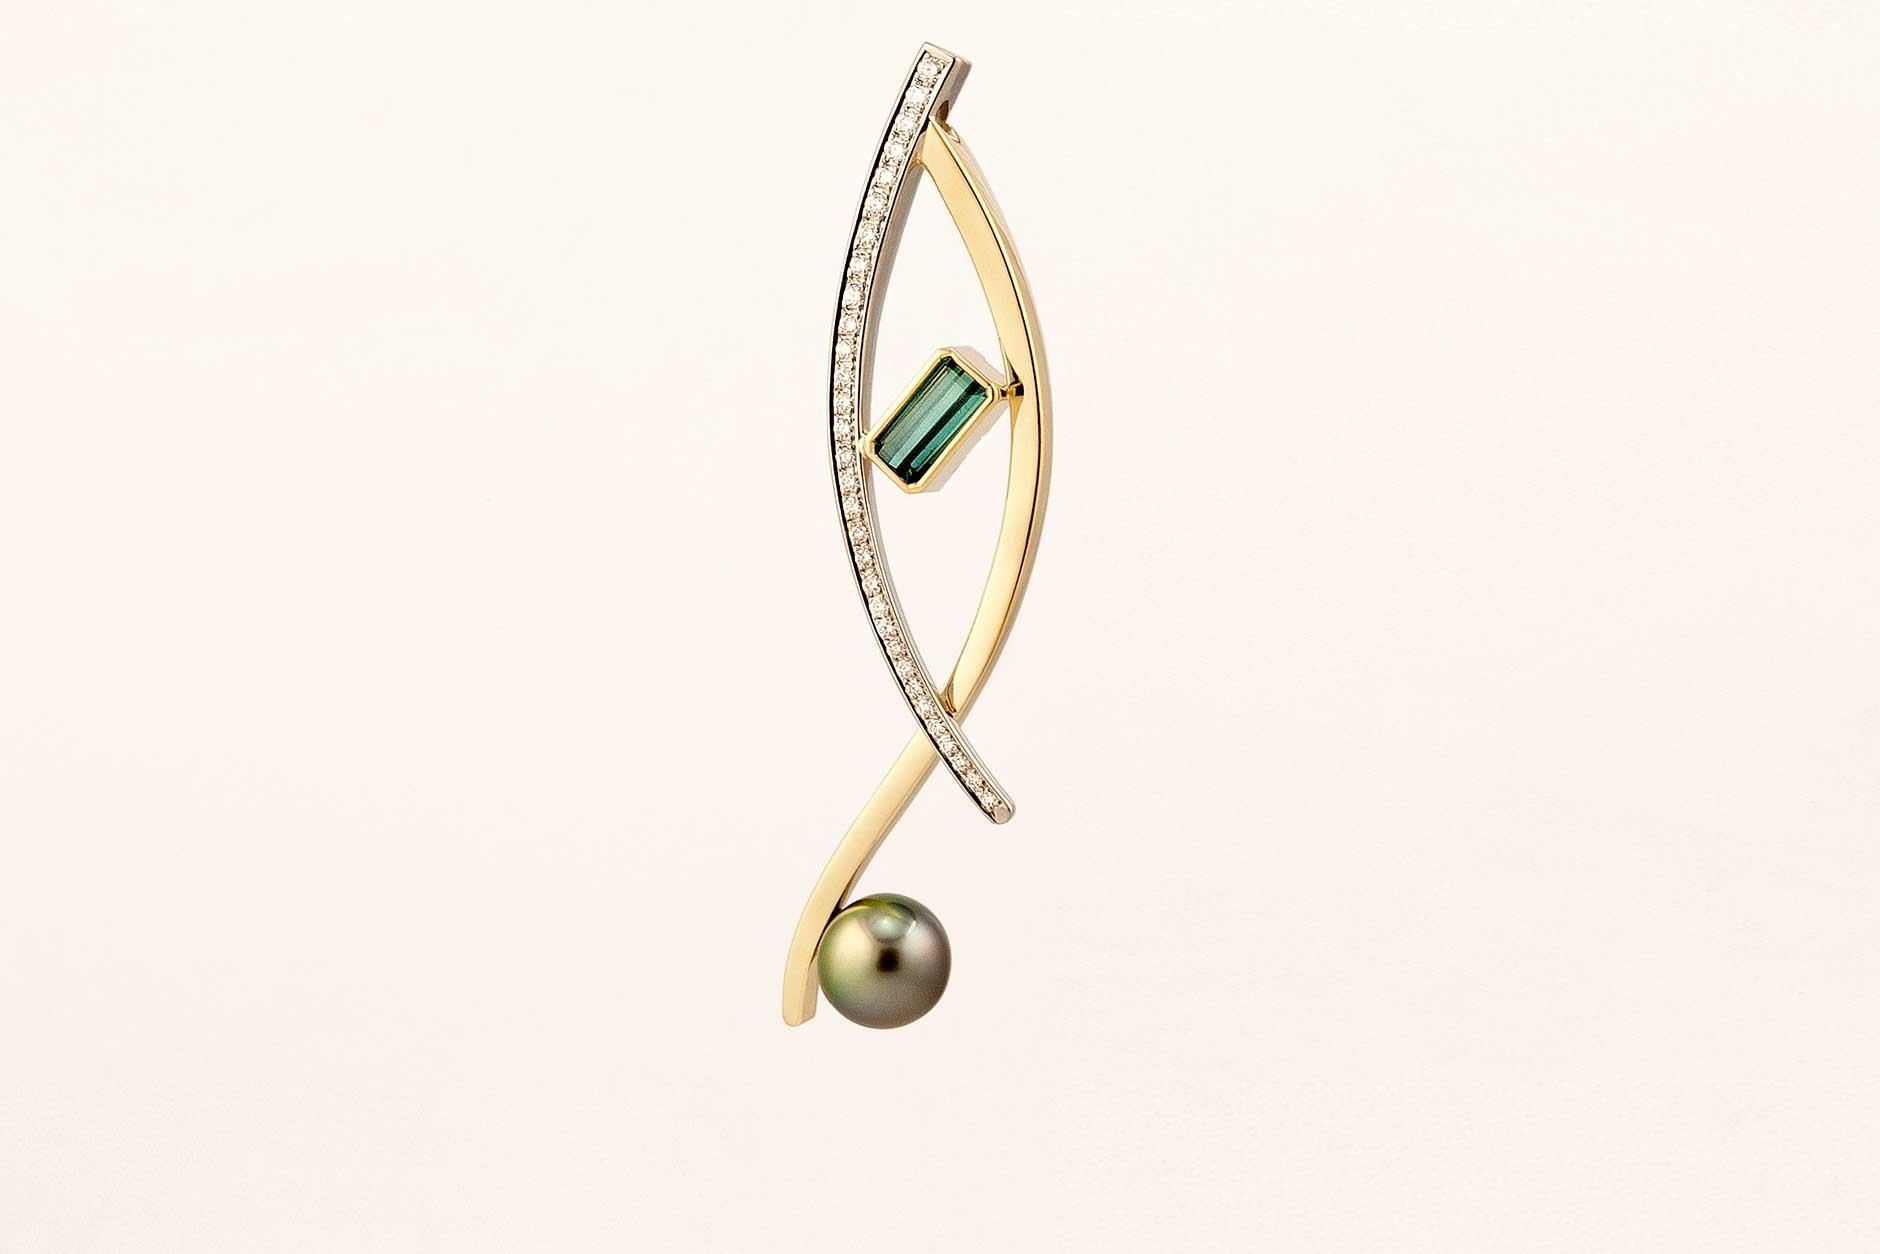 Custom 19k & 18k Gold Blue Green Tourmaline Pendant Diamond Accents with Tahitian Pearl - NEWA Goldsmith